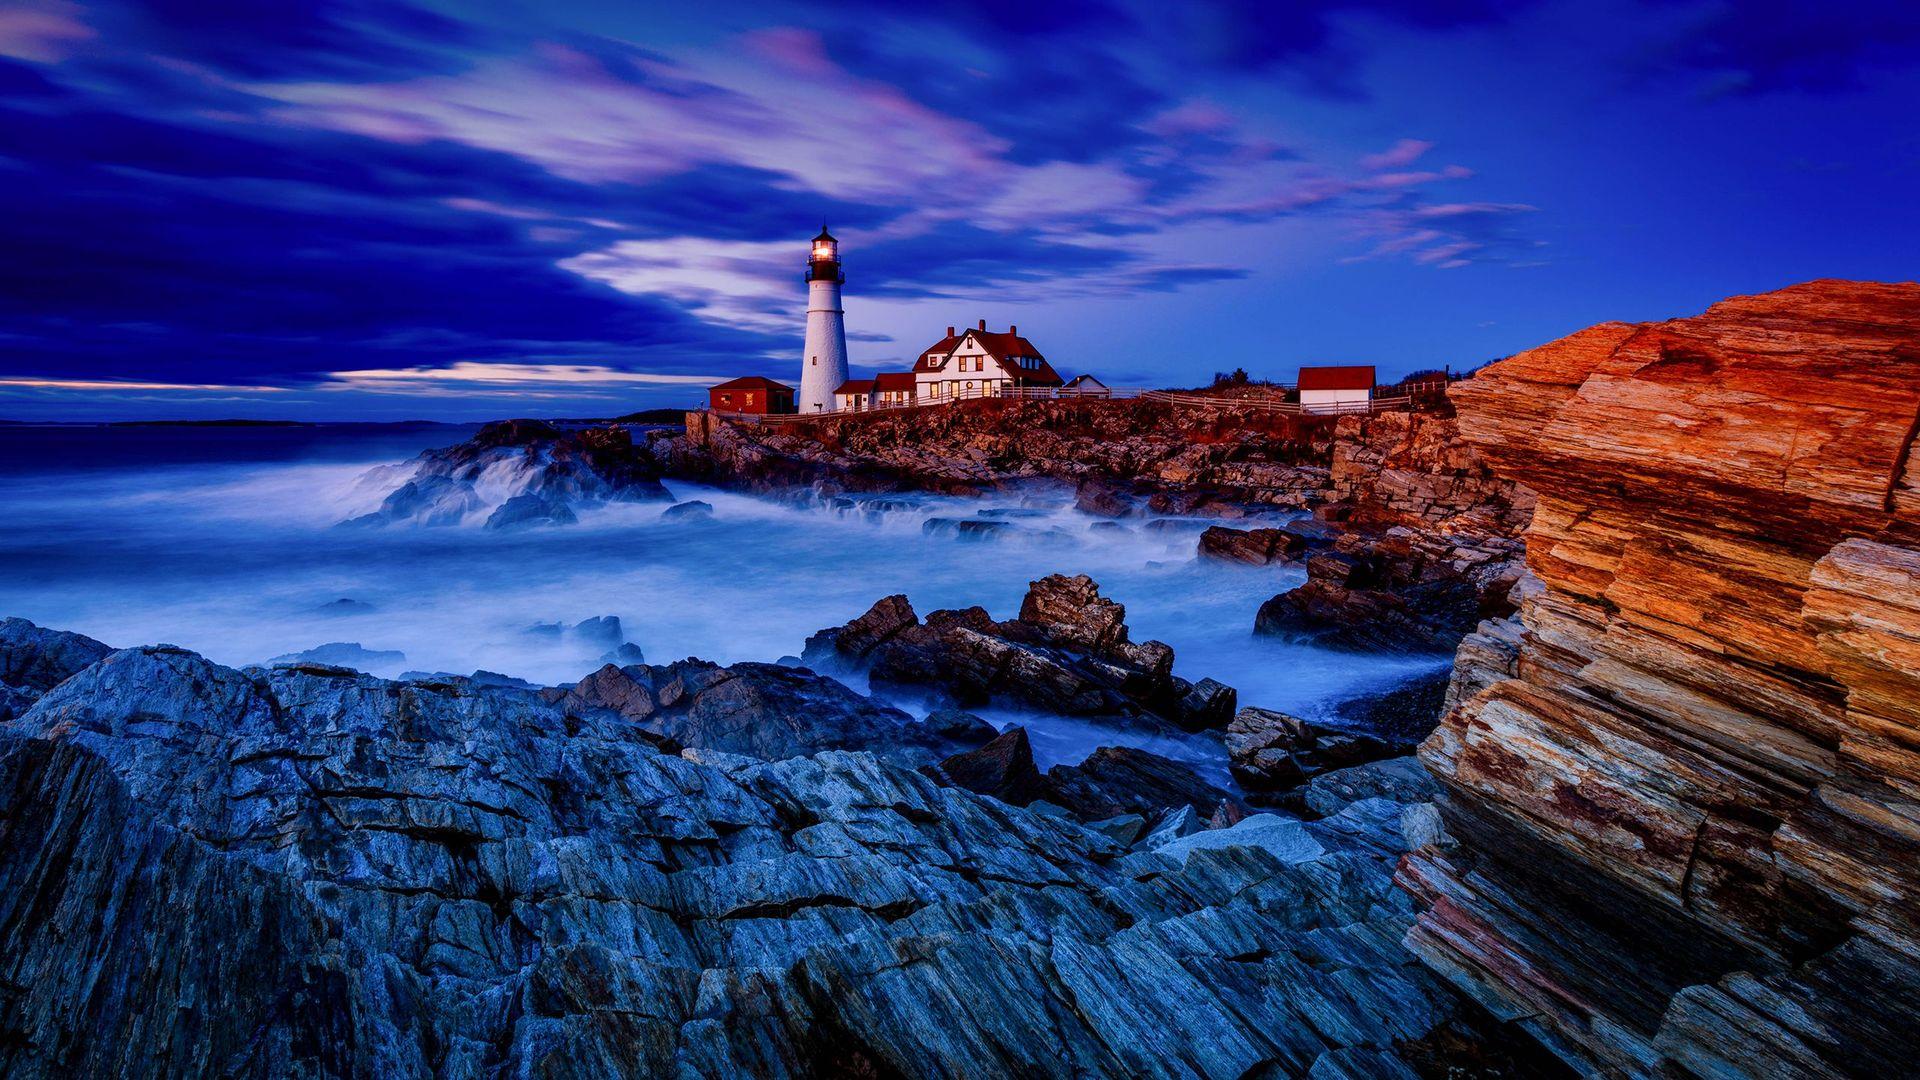 Beautiful lighthouse view wallpaper 18801 1920x1080